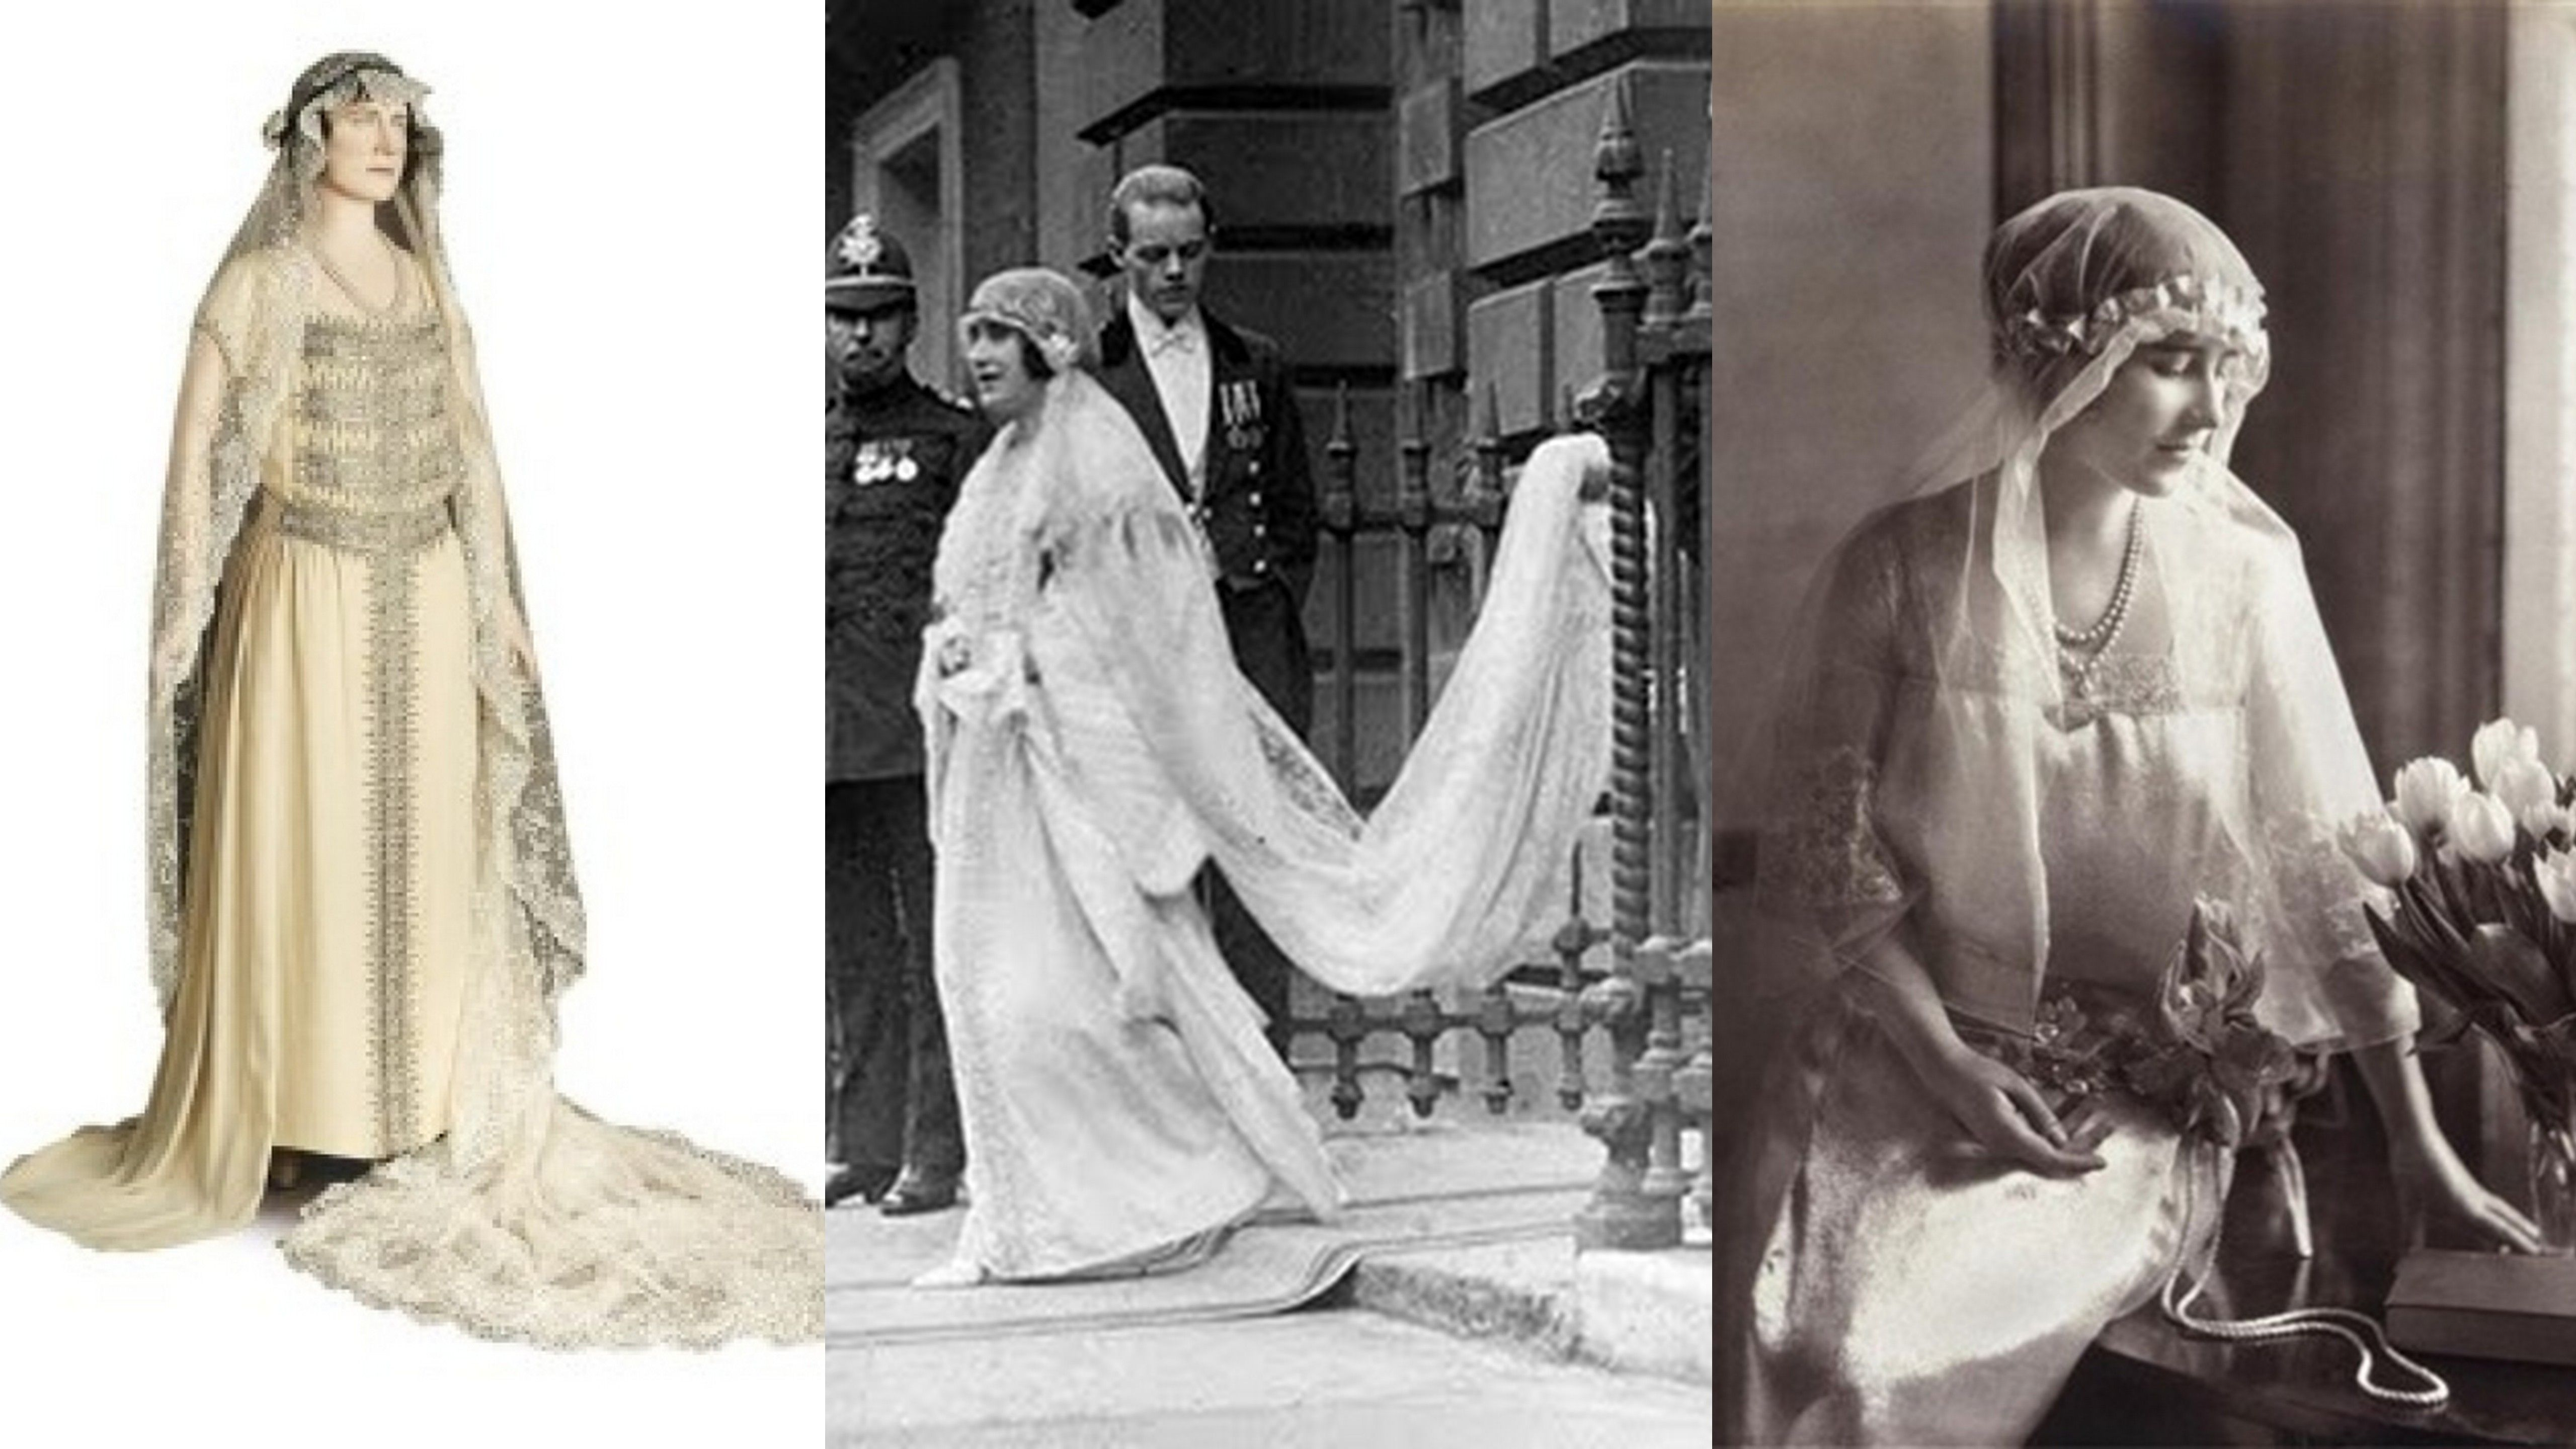 Lady Elizabeth Angela Marguerite Bowes Lyon Became Queen Elizabeth The Queen Consort To King George Vi Her Fashion Royal Weddings Royal Brides Lady Elizabeth